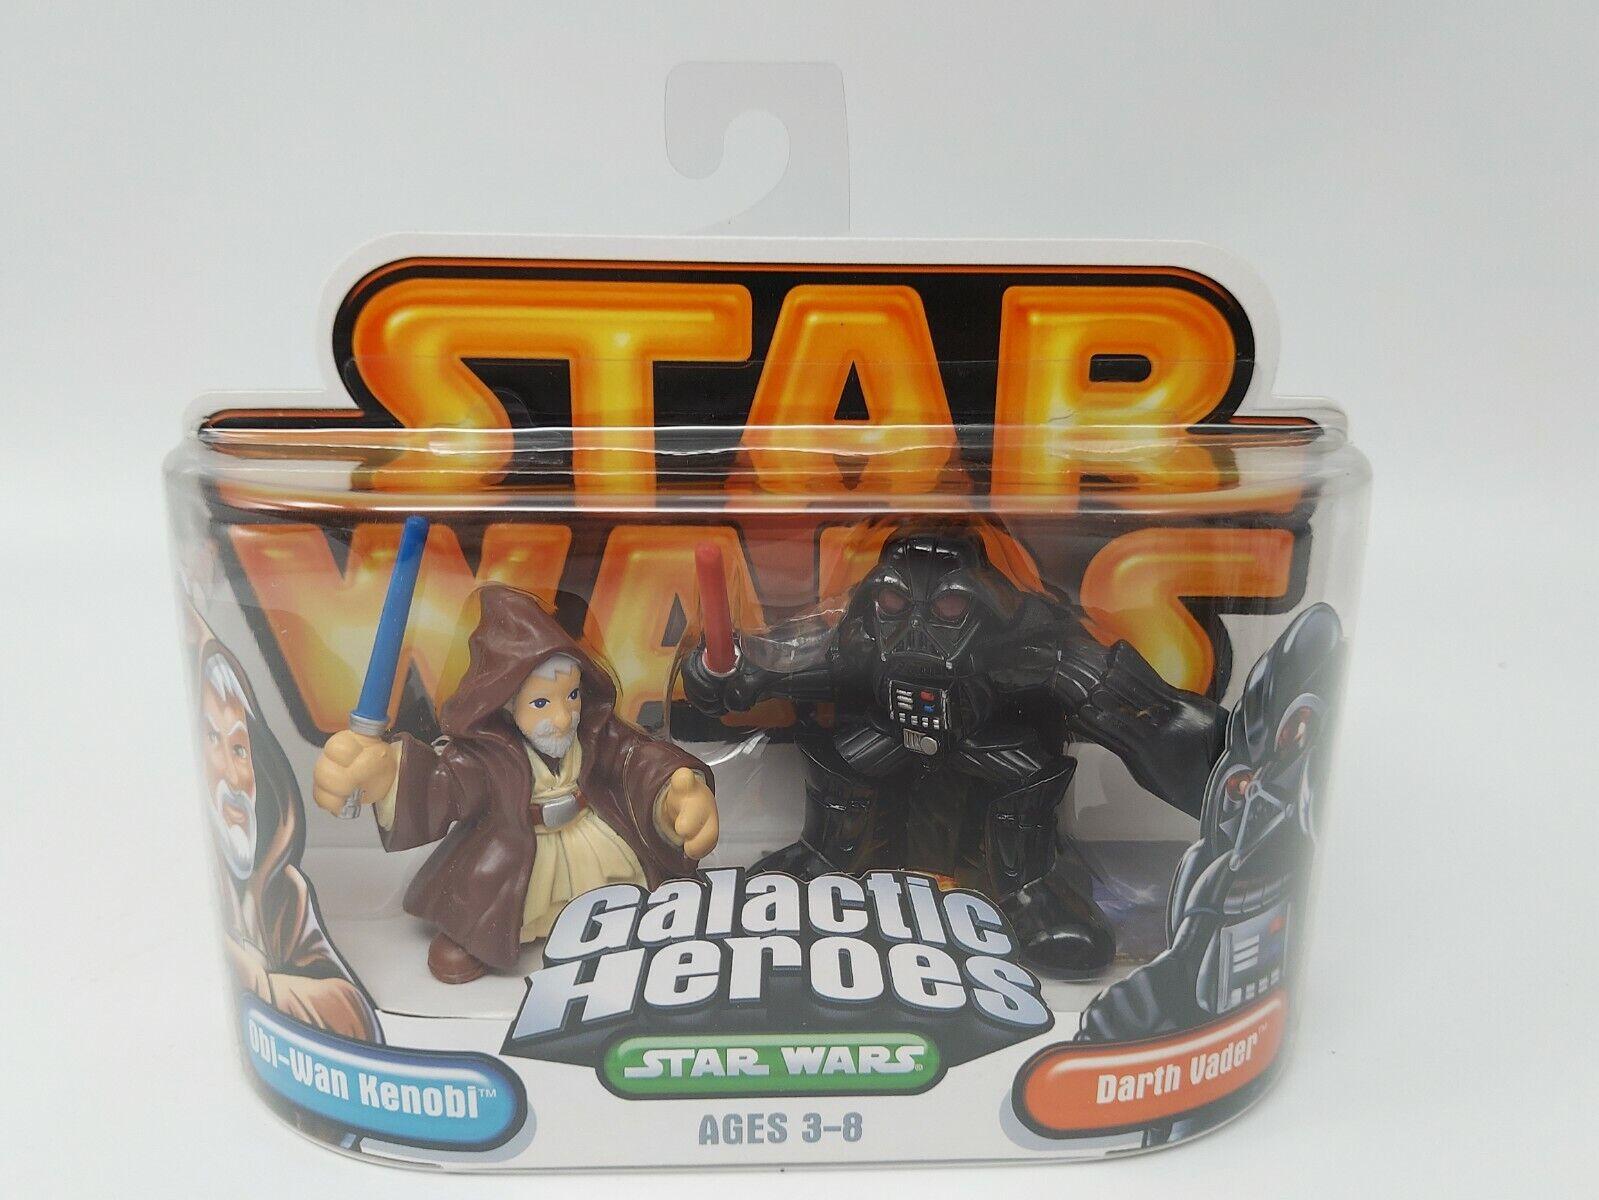 Star Wars Galactic Heroes Darth Vader and Obi Wan Kenobi 2 Pack - Factory Sealed